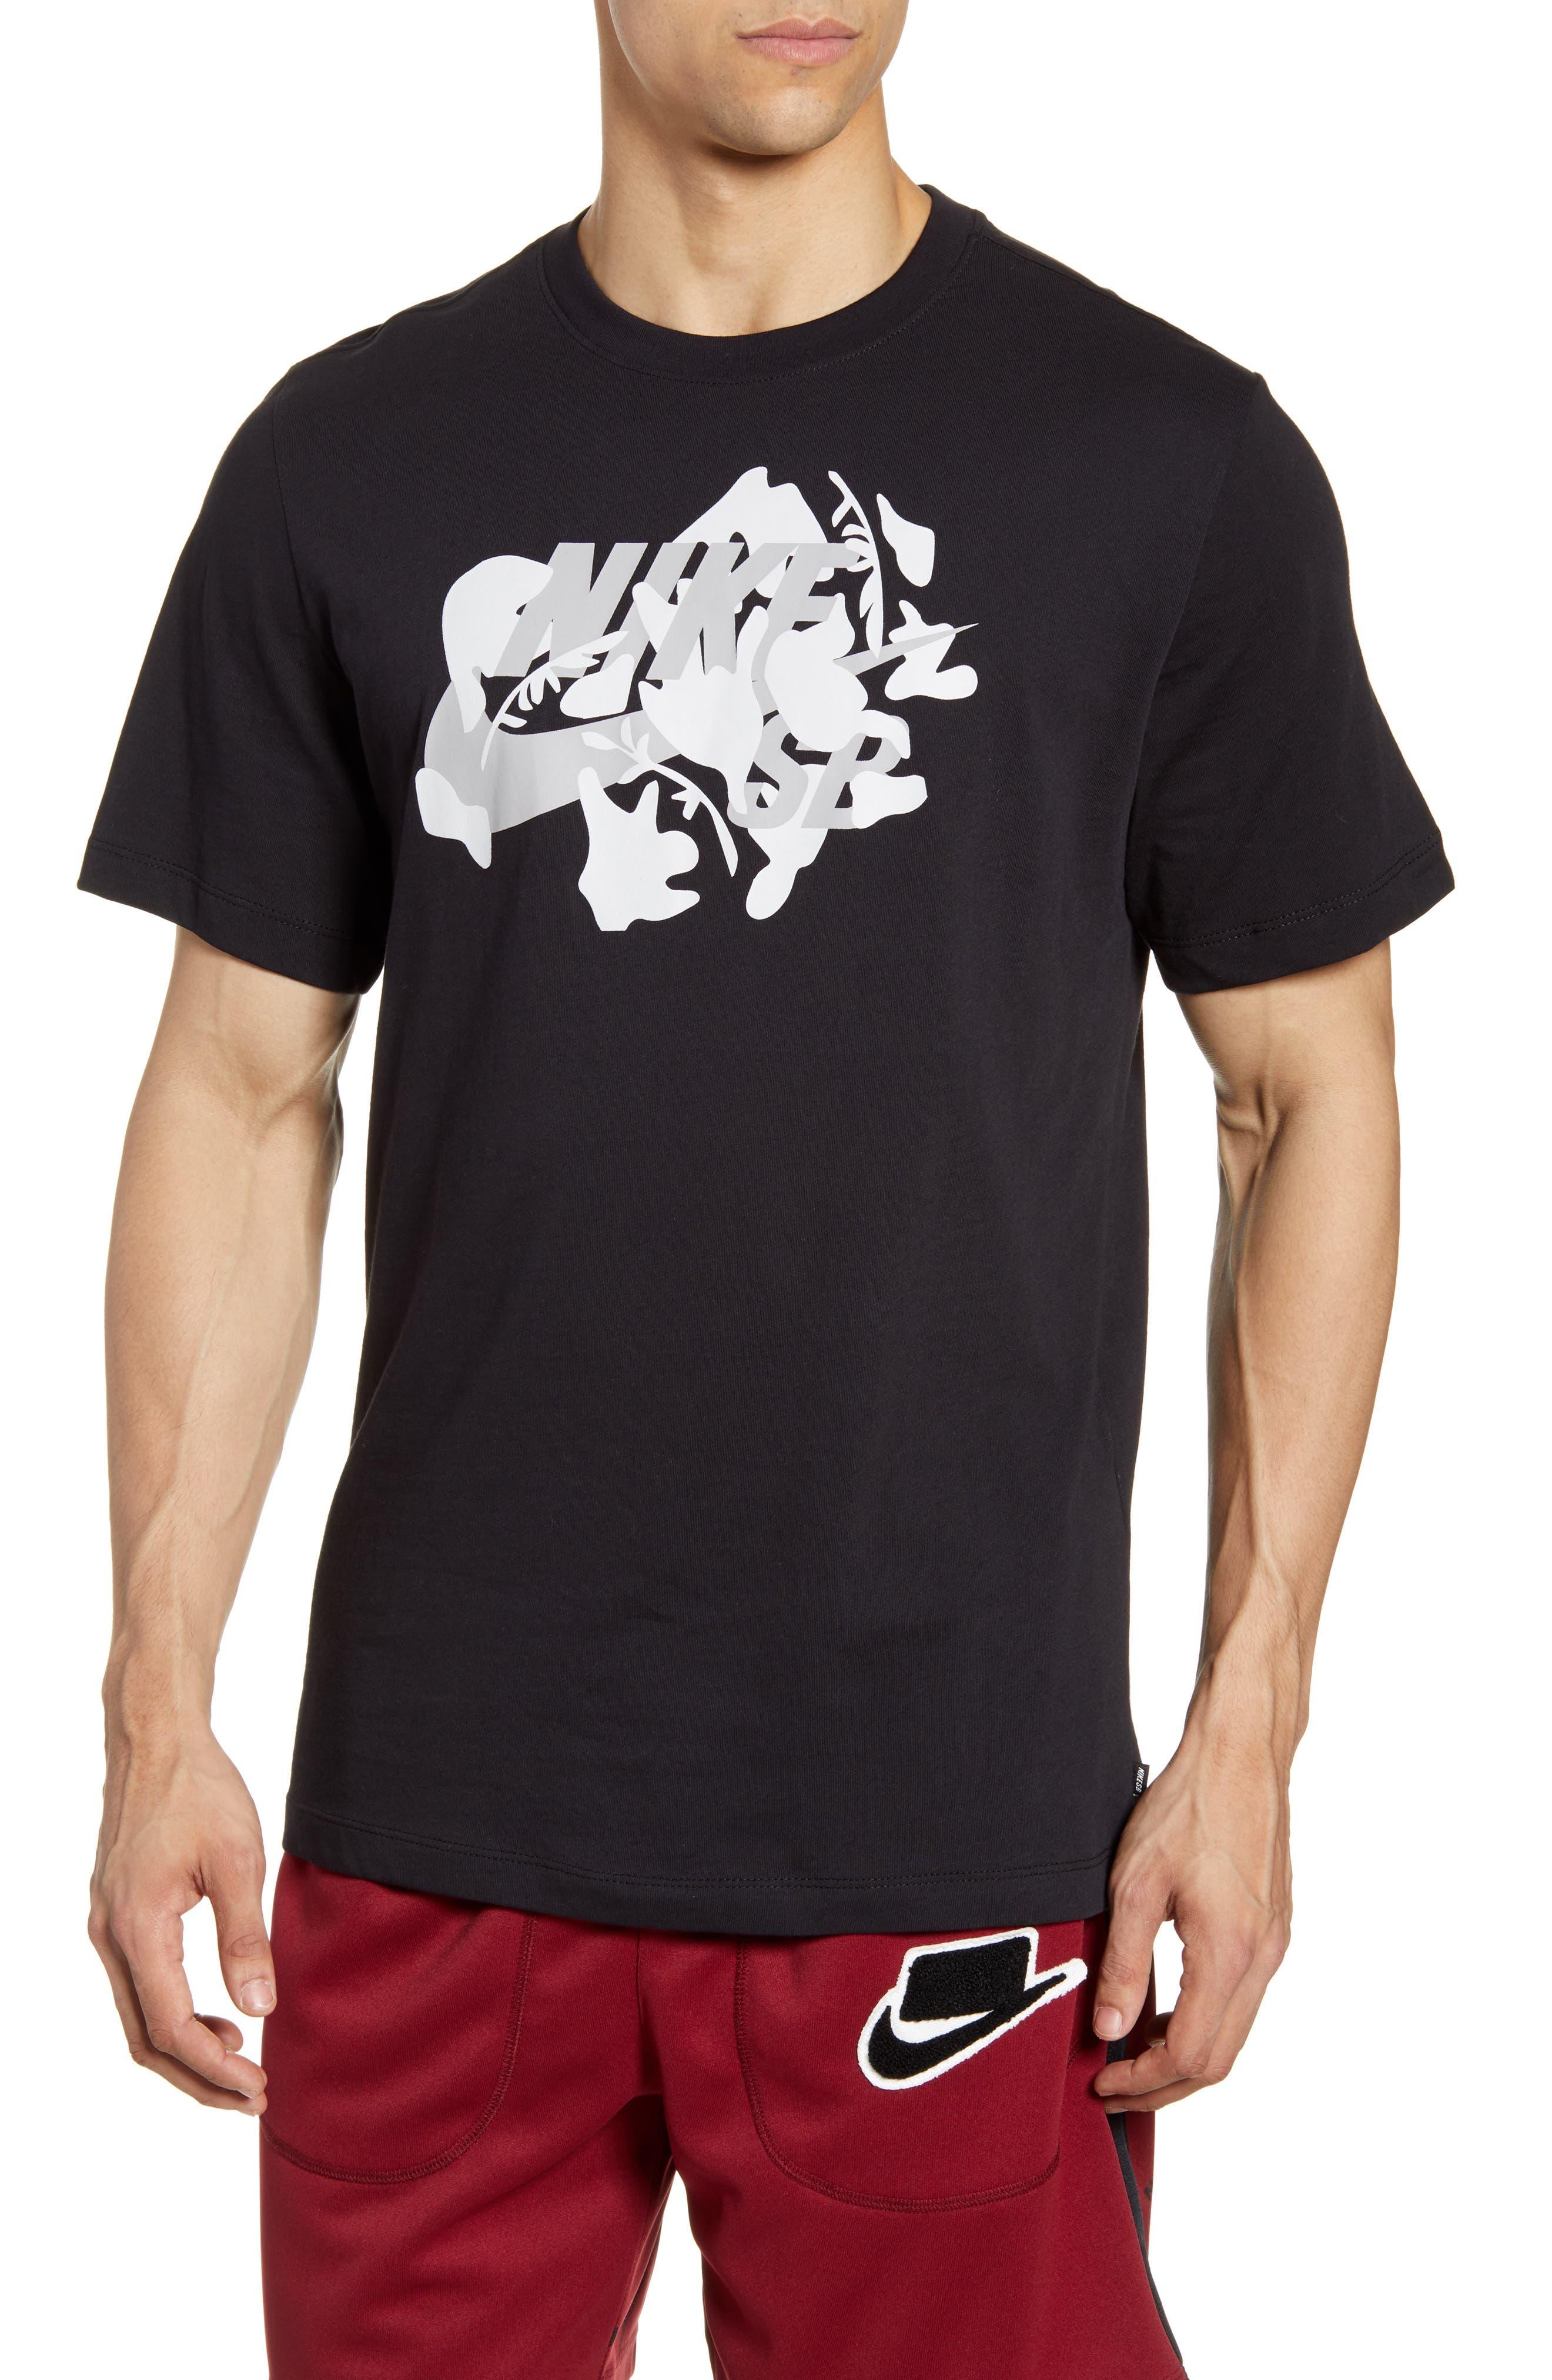 4595ce228 Men's NIKE SB T-Shirts, Tank Tops, & Graphic Tees | Nordstrom